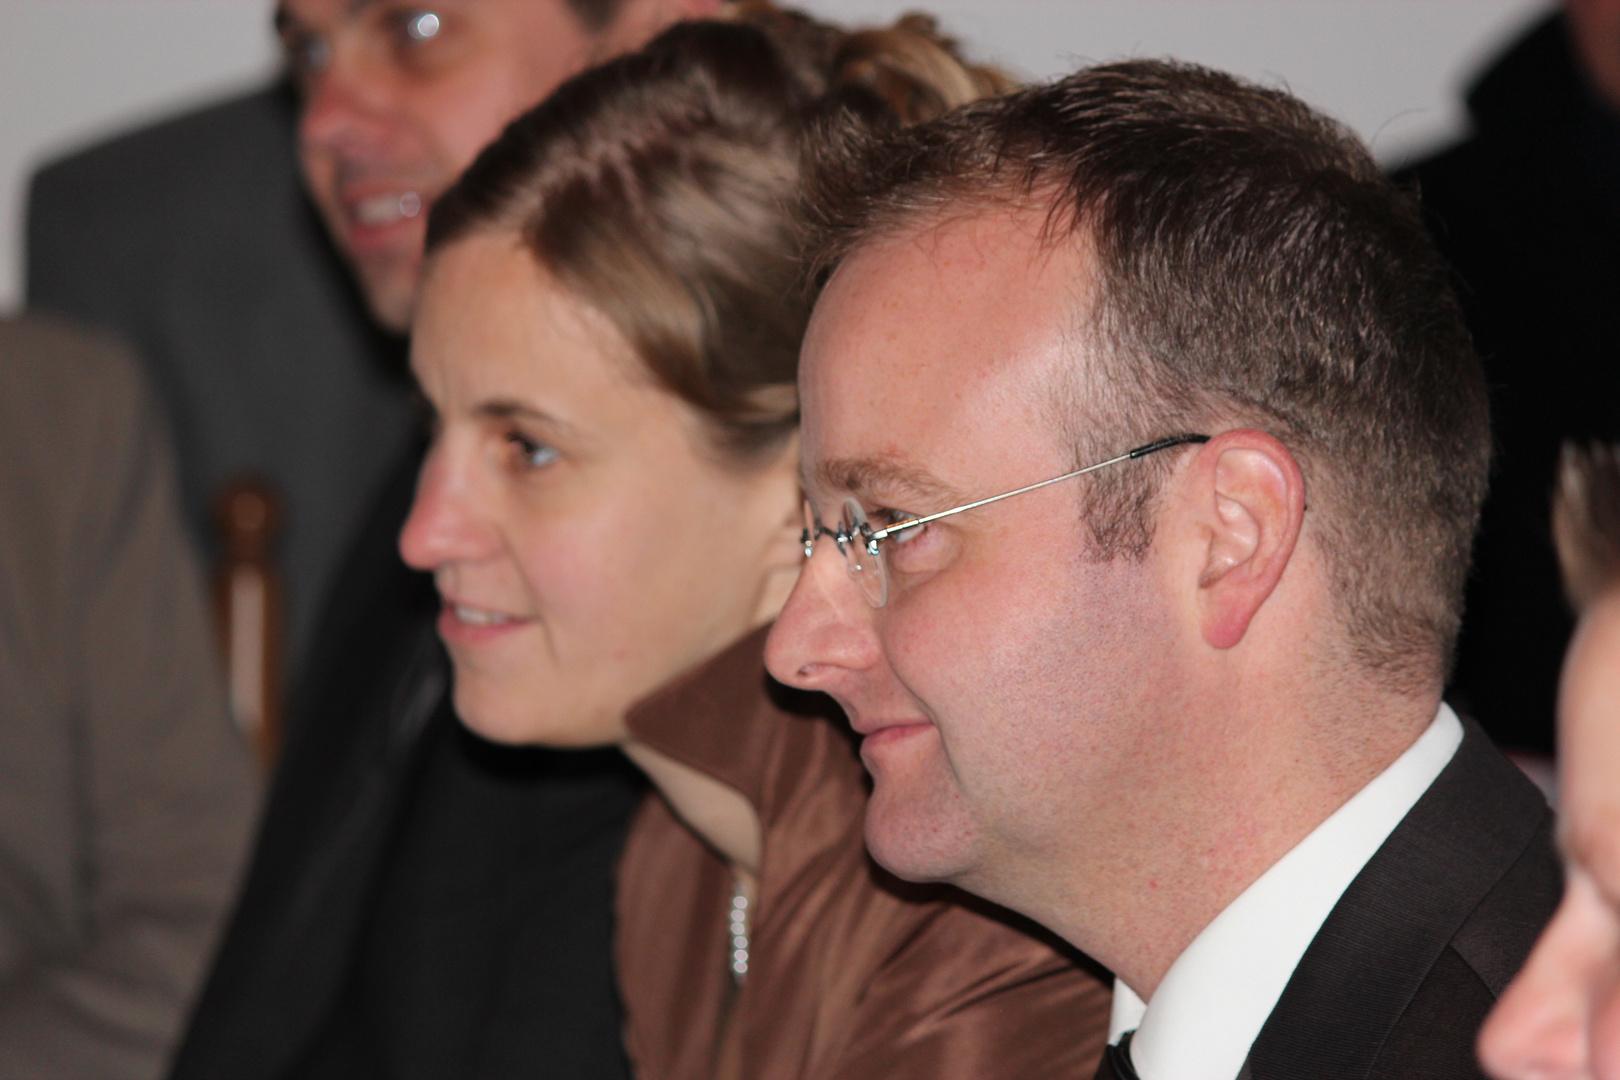 Trauung November 2011